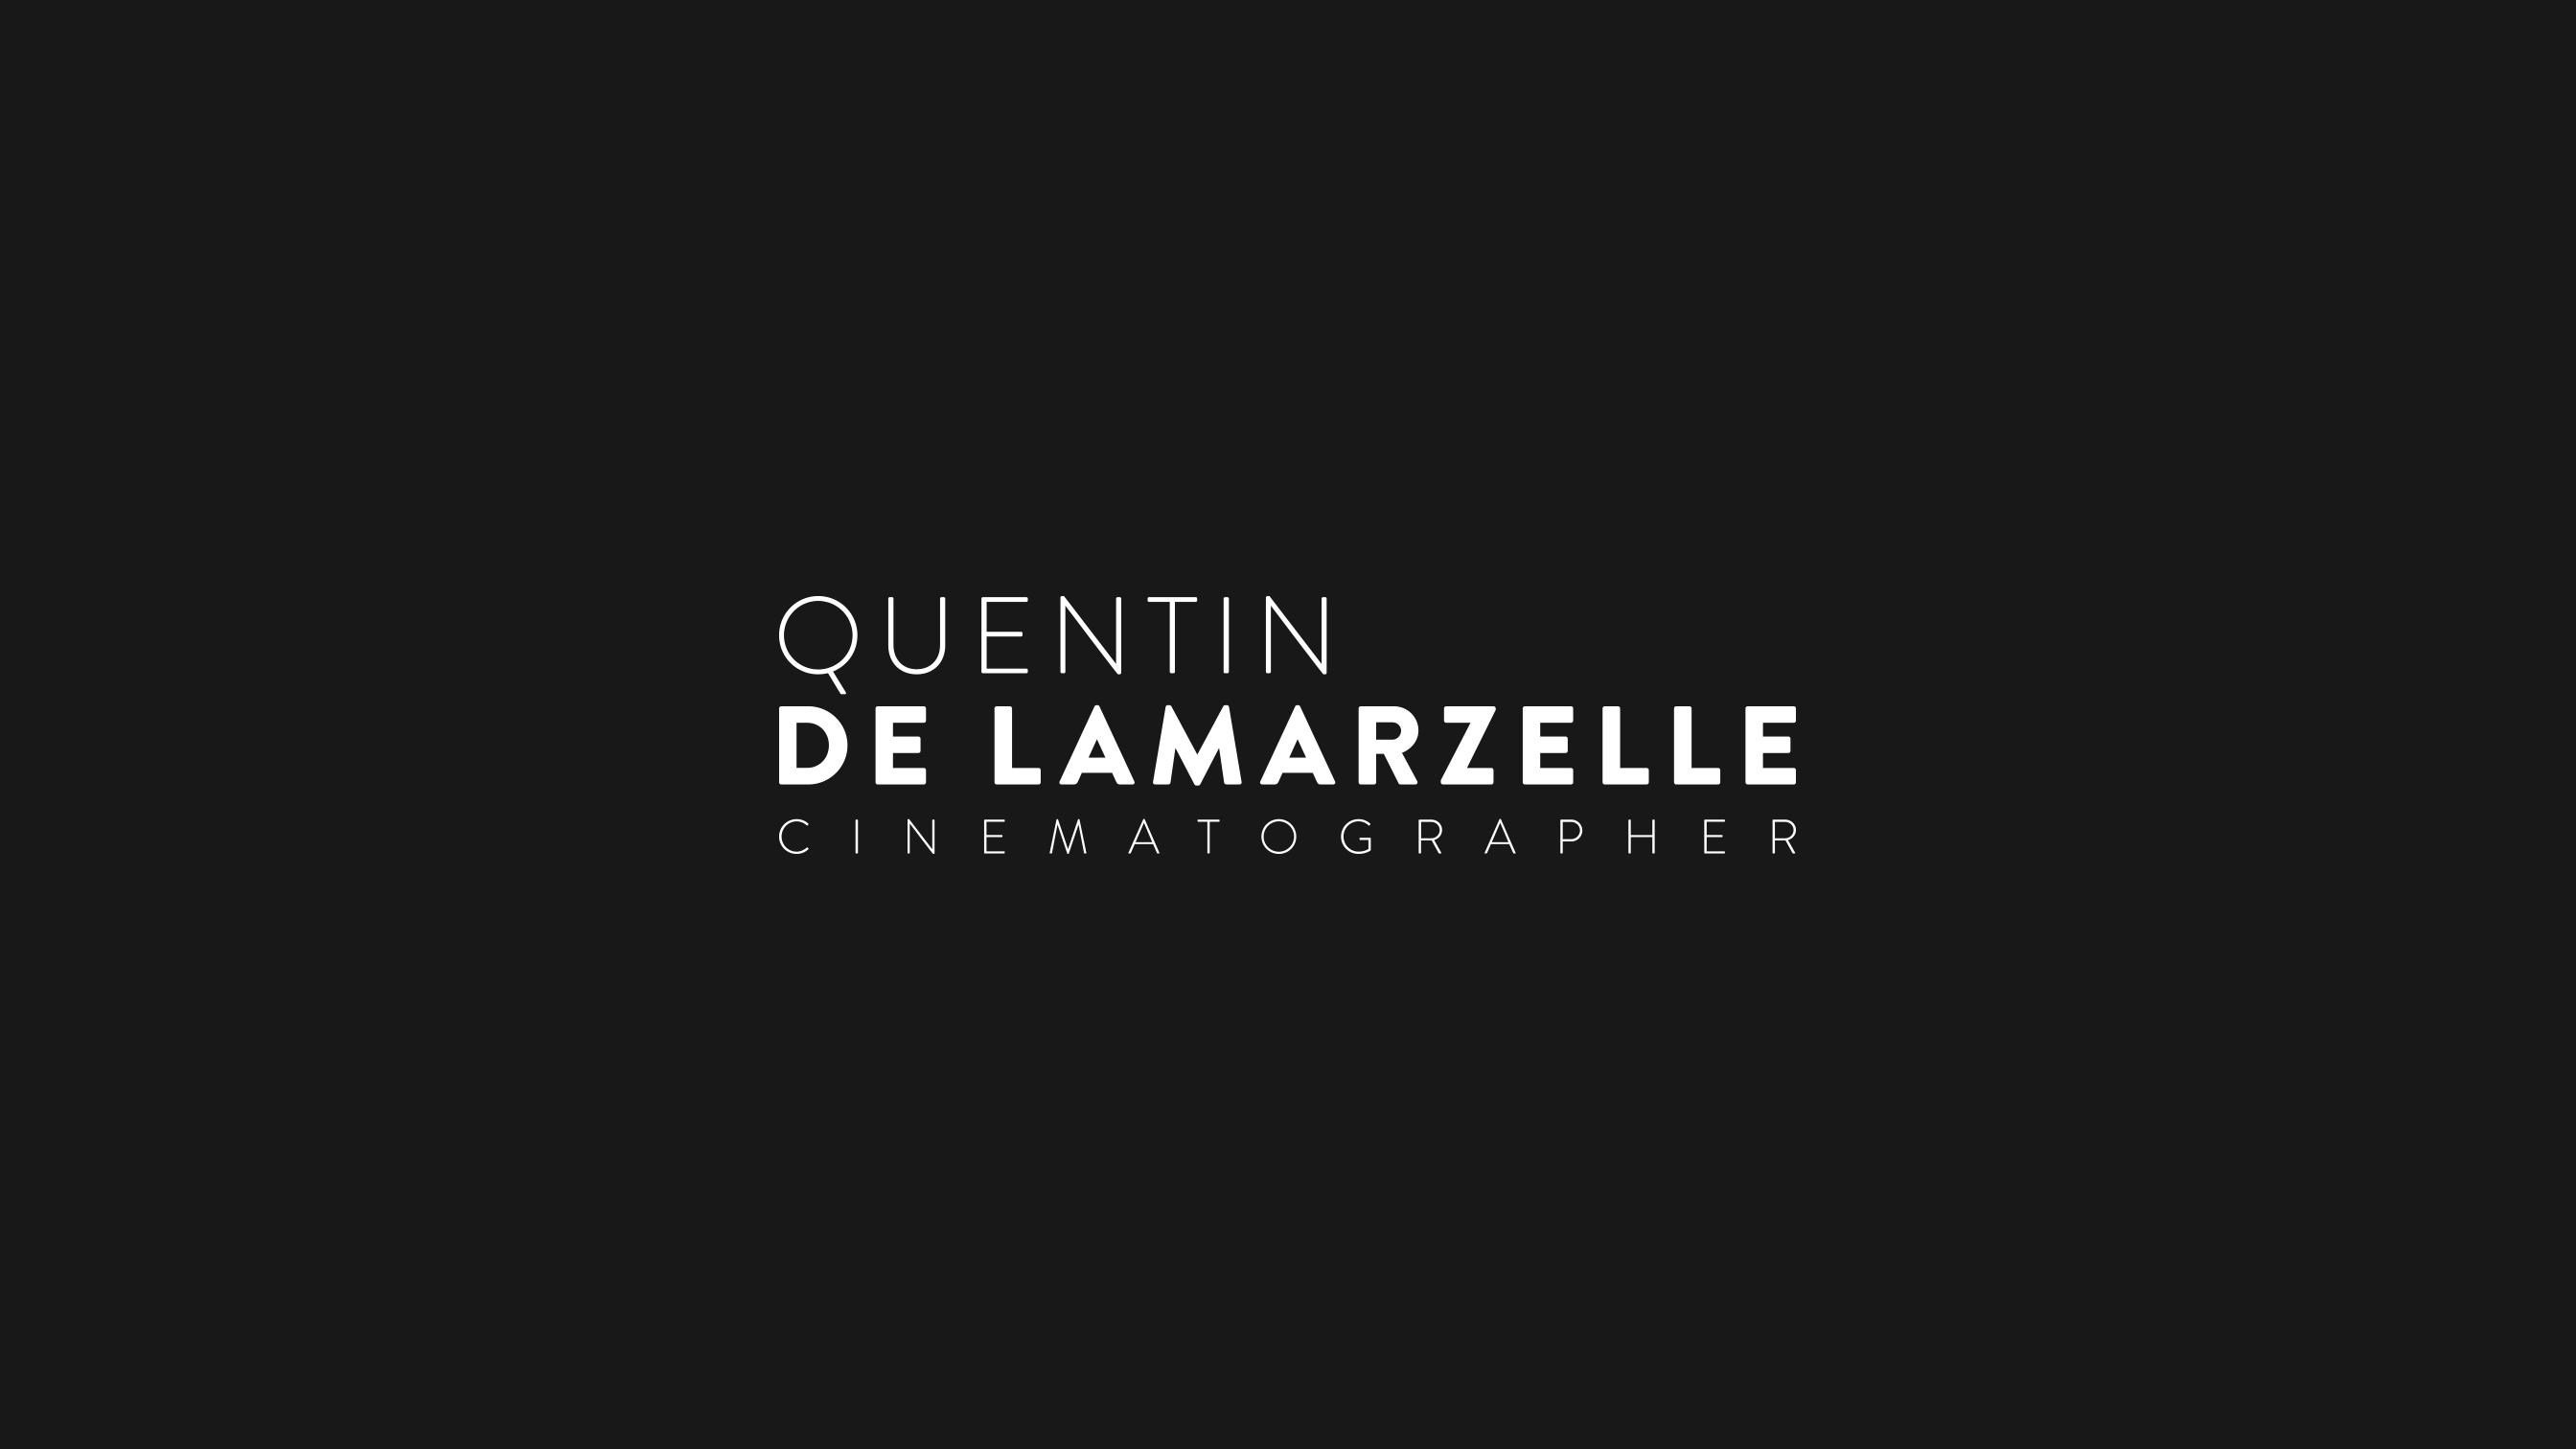 showcase-logotype-quentin-de-lamarzelle